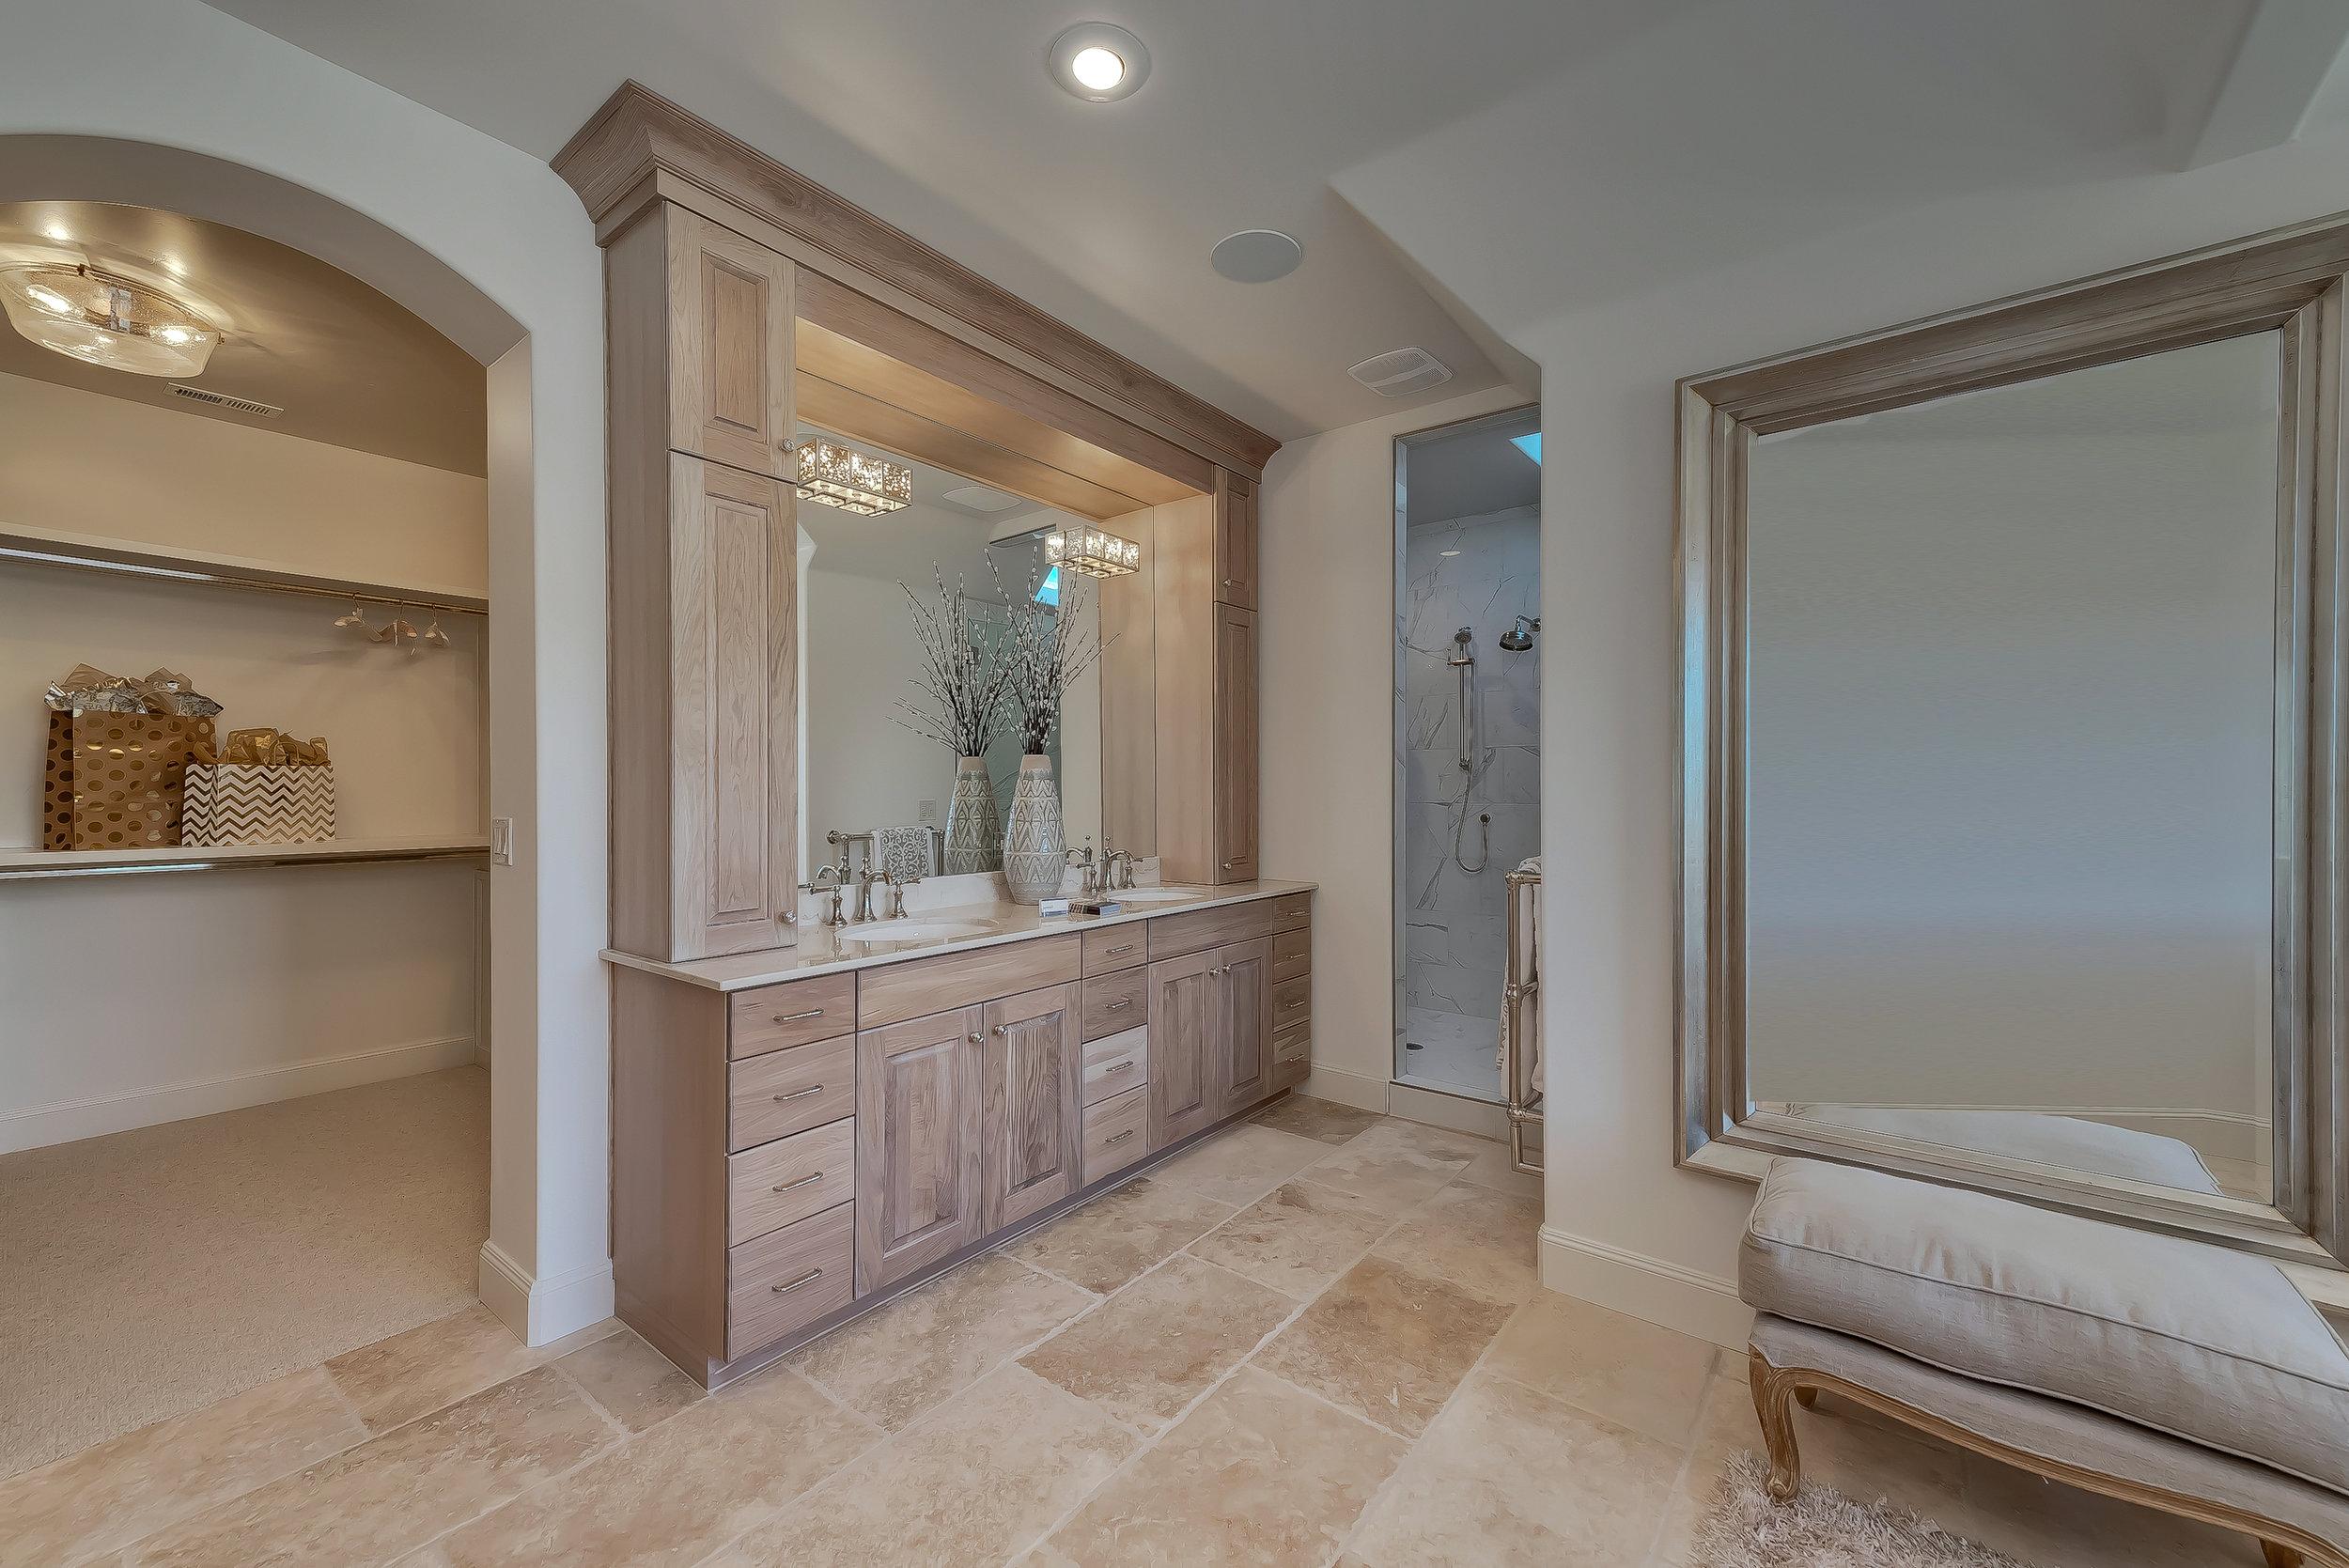 042_Master Bathroom .jpg